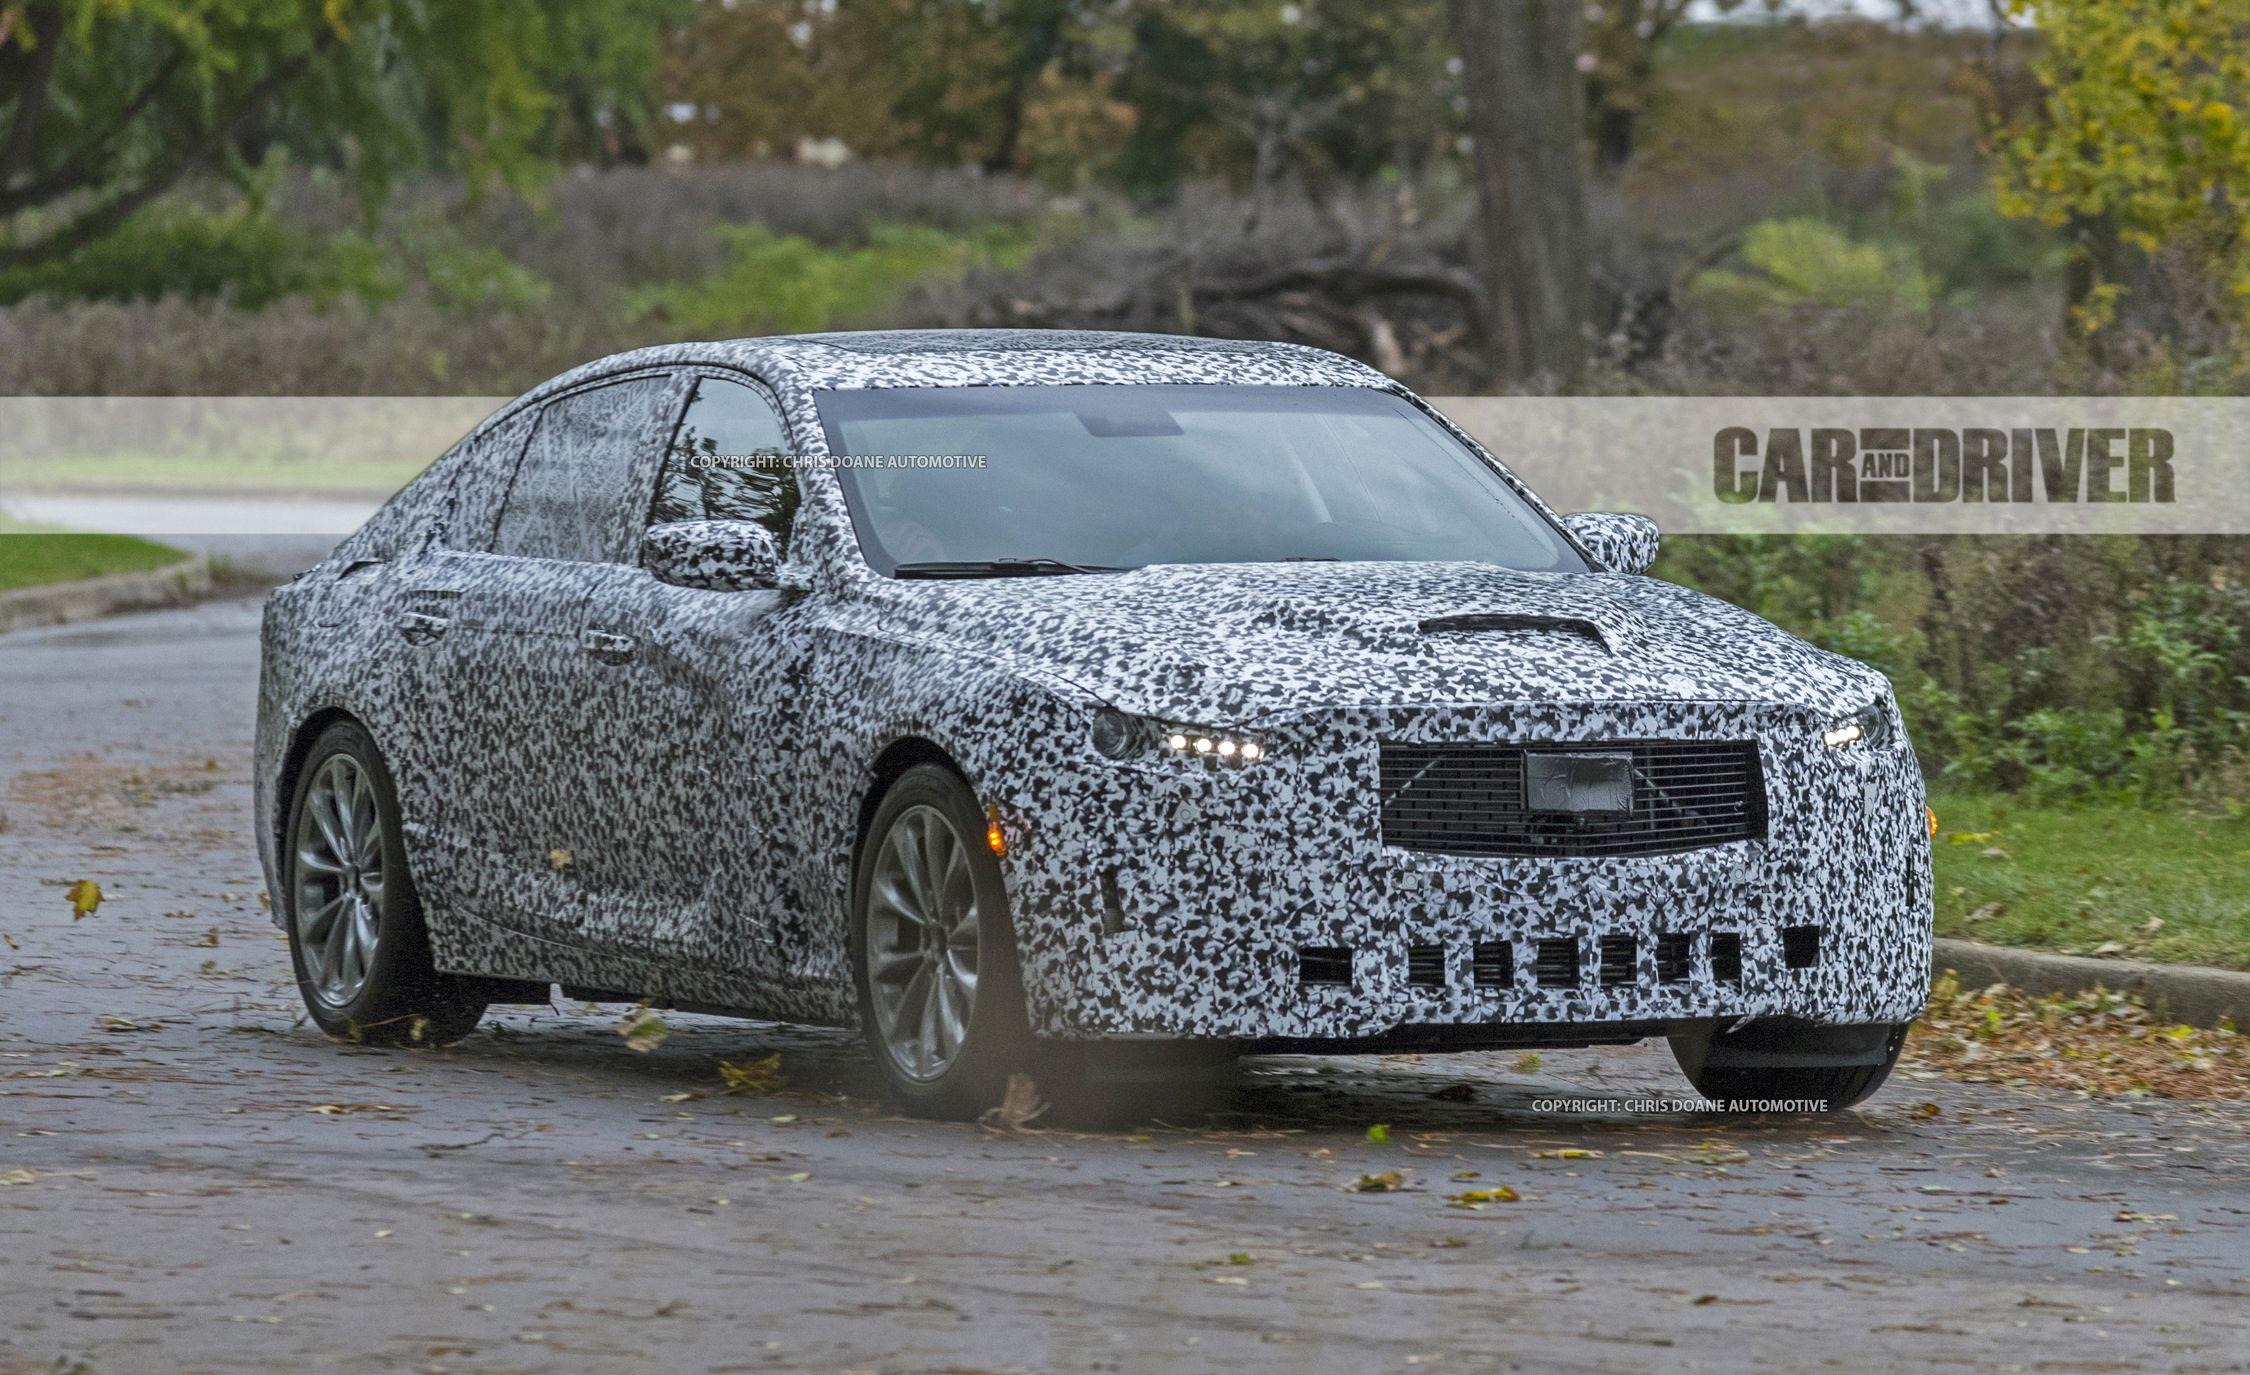 2020 Cadillac CT5 Sports Sedan Spied Will Battle The 3